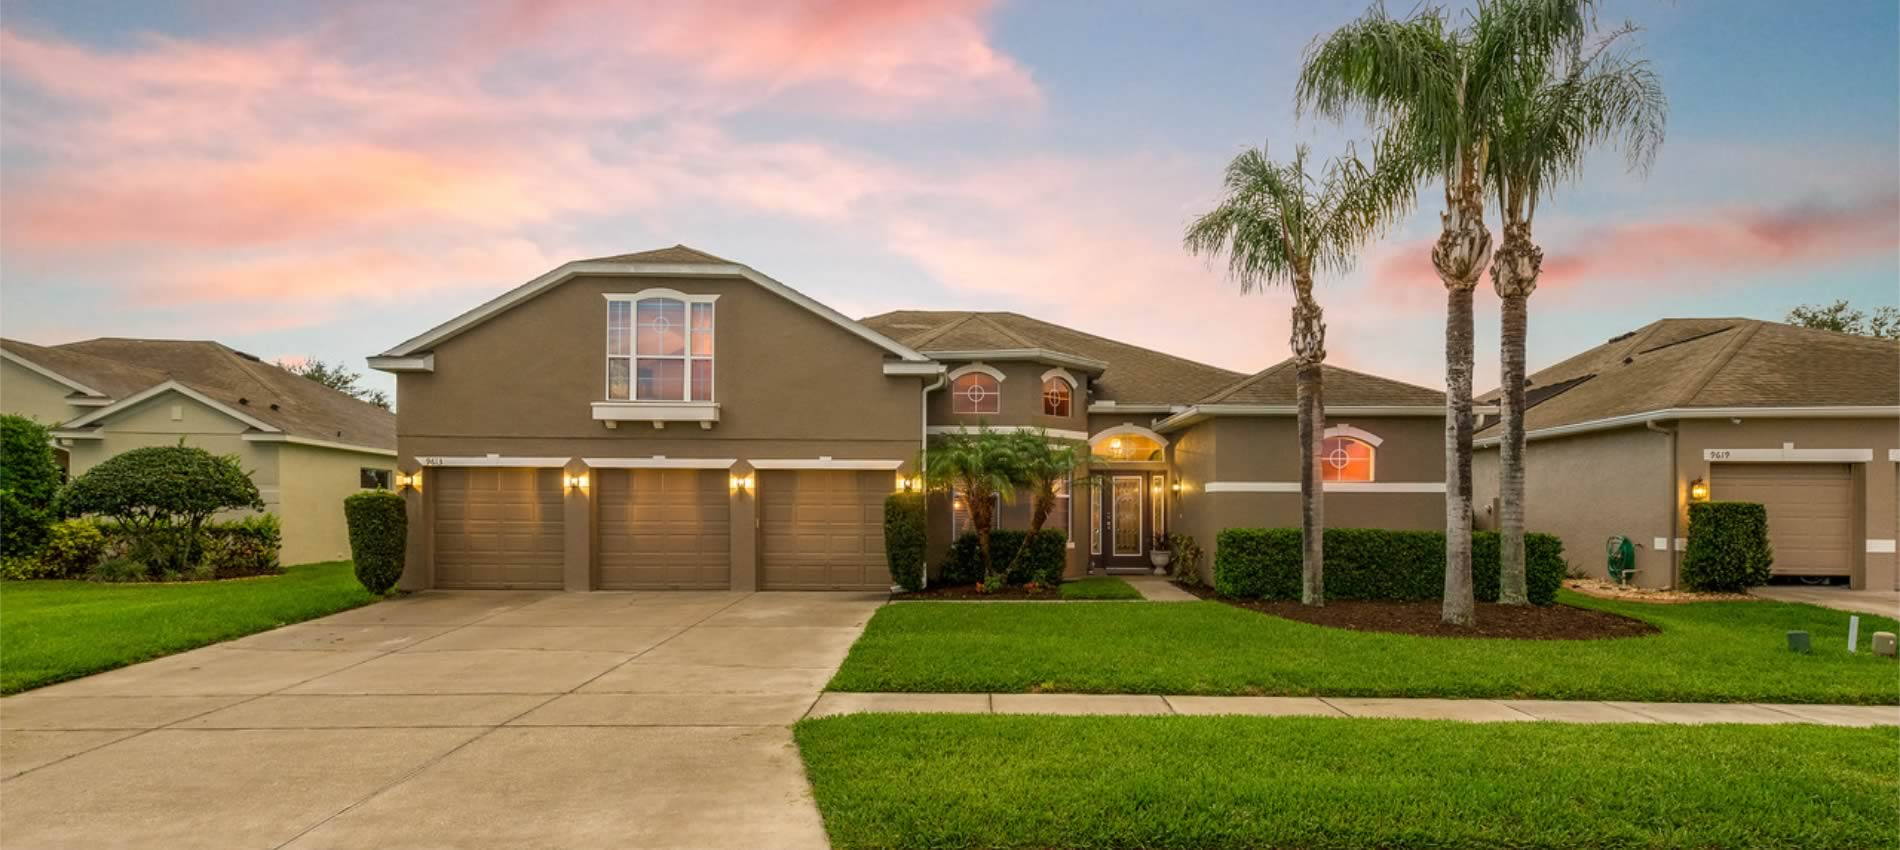 Home - Orlando Regional Realty